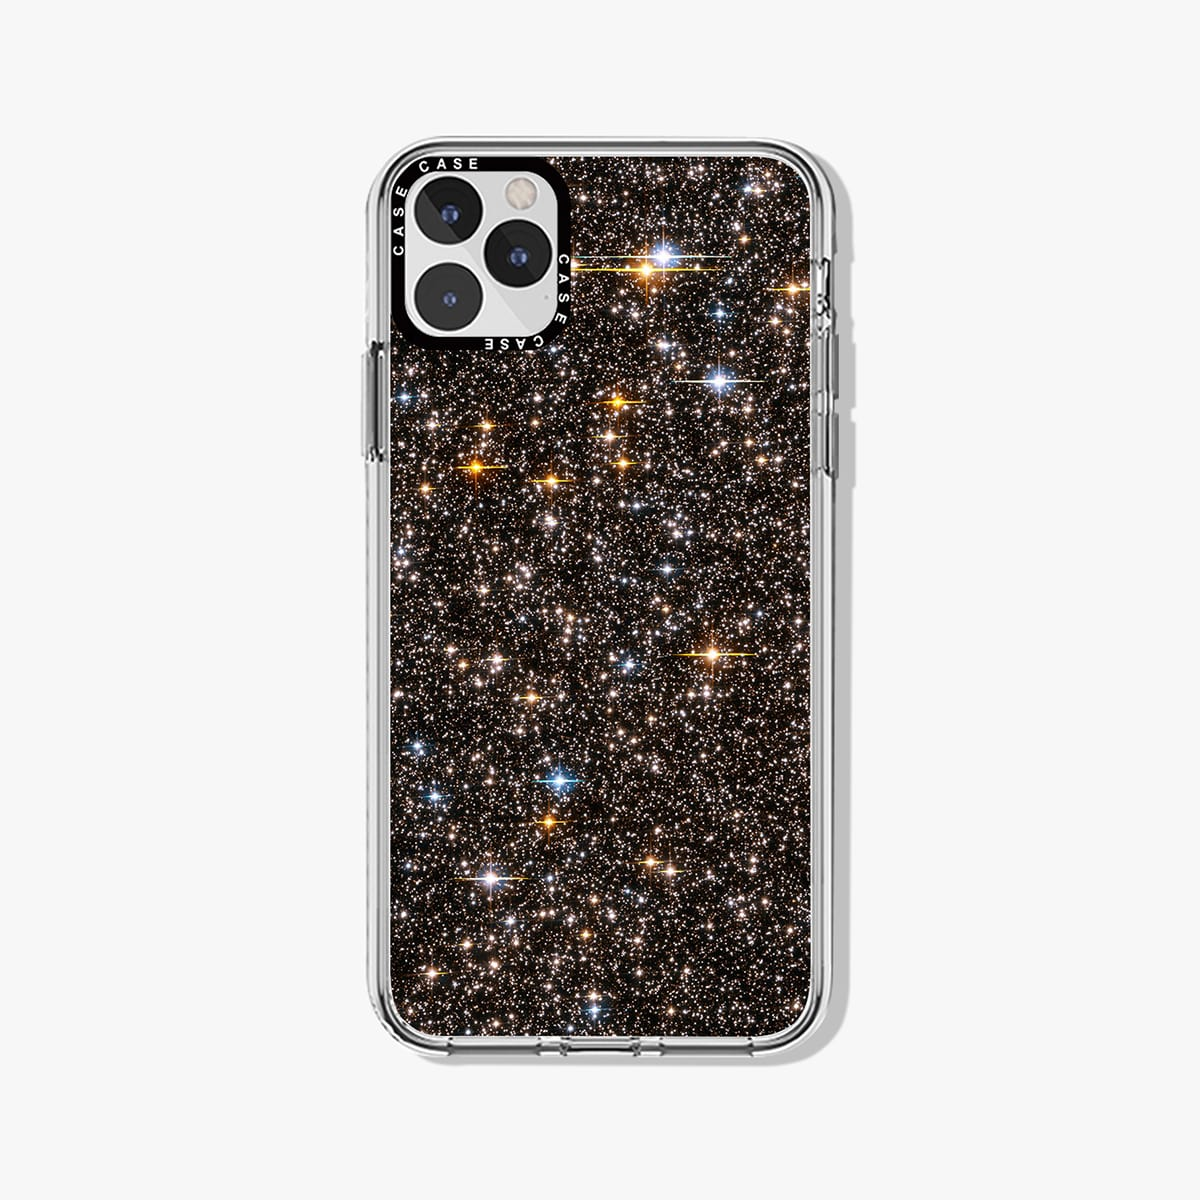 Custodia per telefono Starry Sky